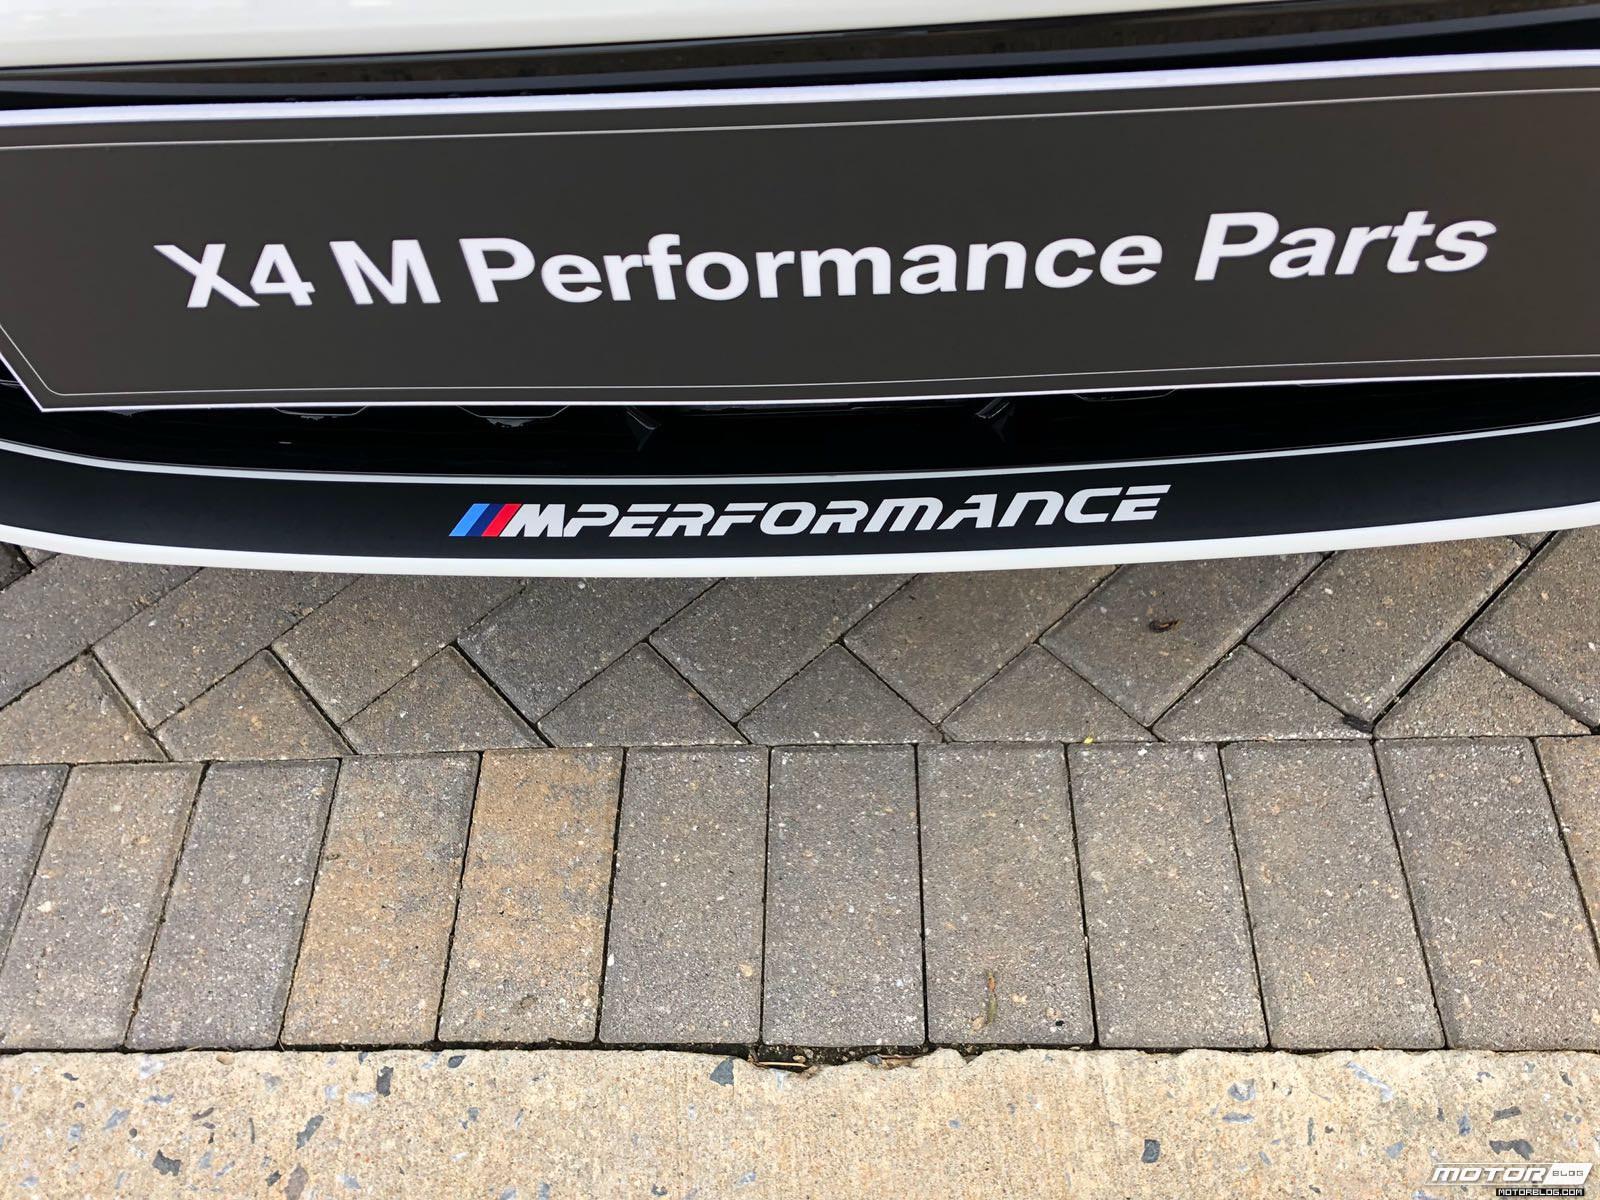 BMW x4 2018 Premiere Spartanburg media event